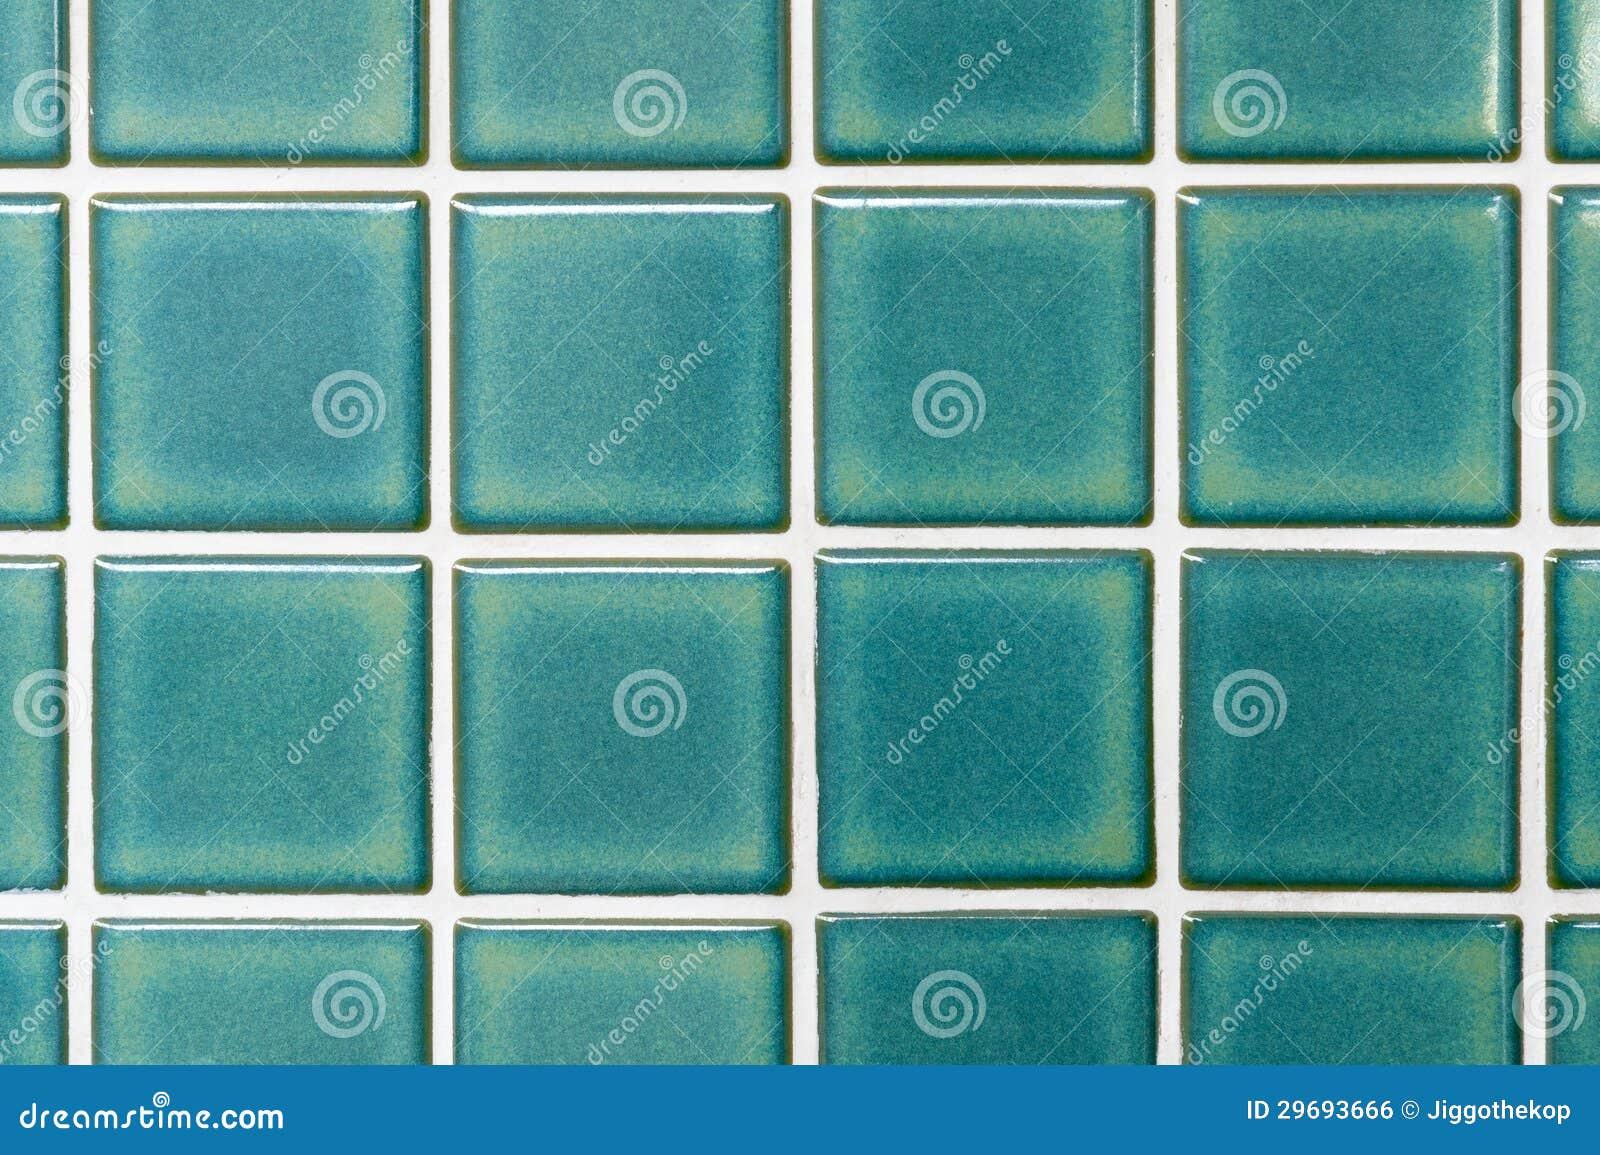 Piastrelle di ceramica verdi immagine stock libera da - Piastrelle verdi ...